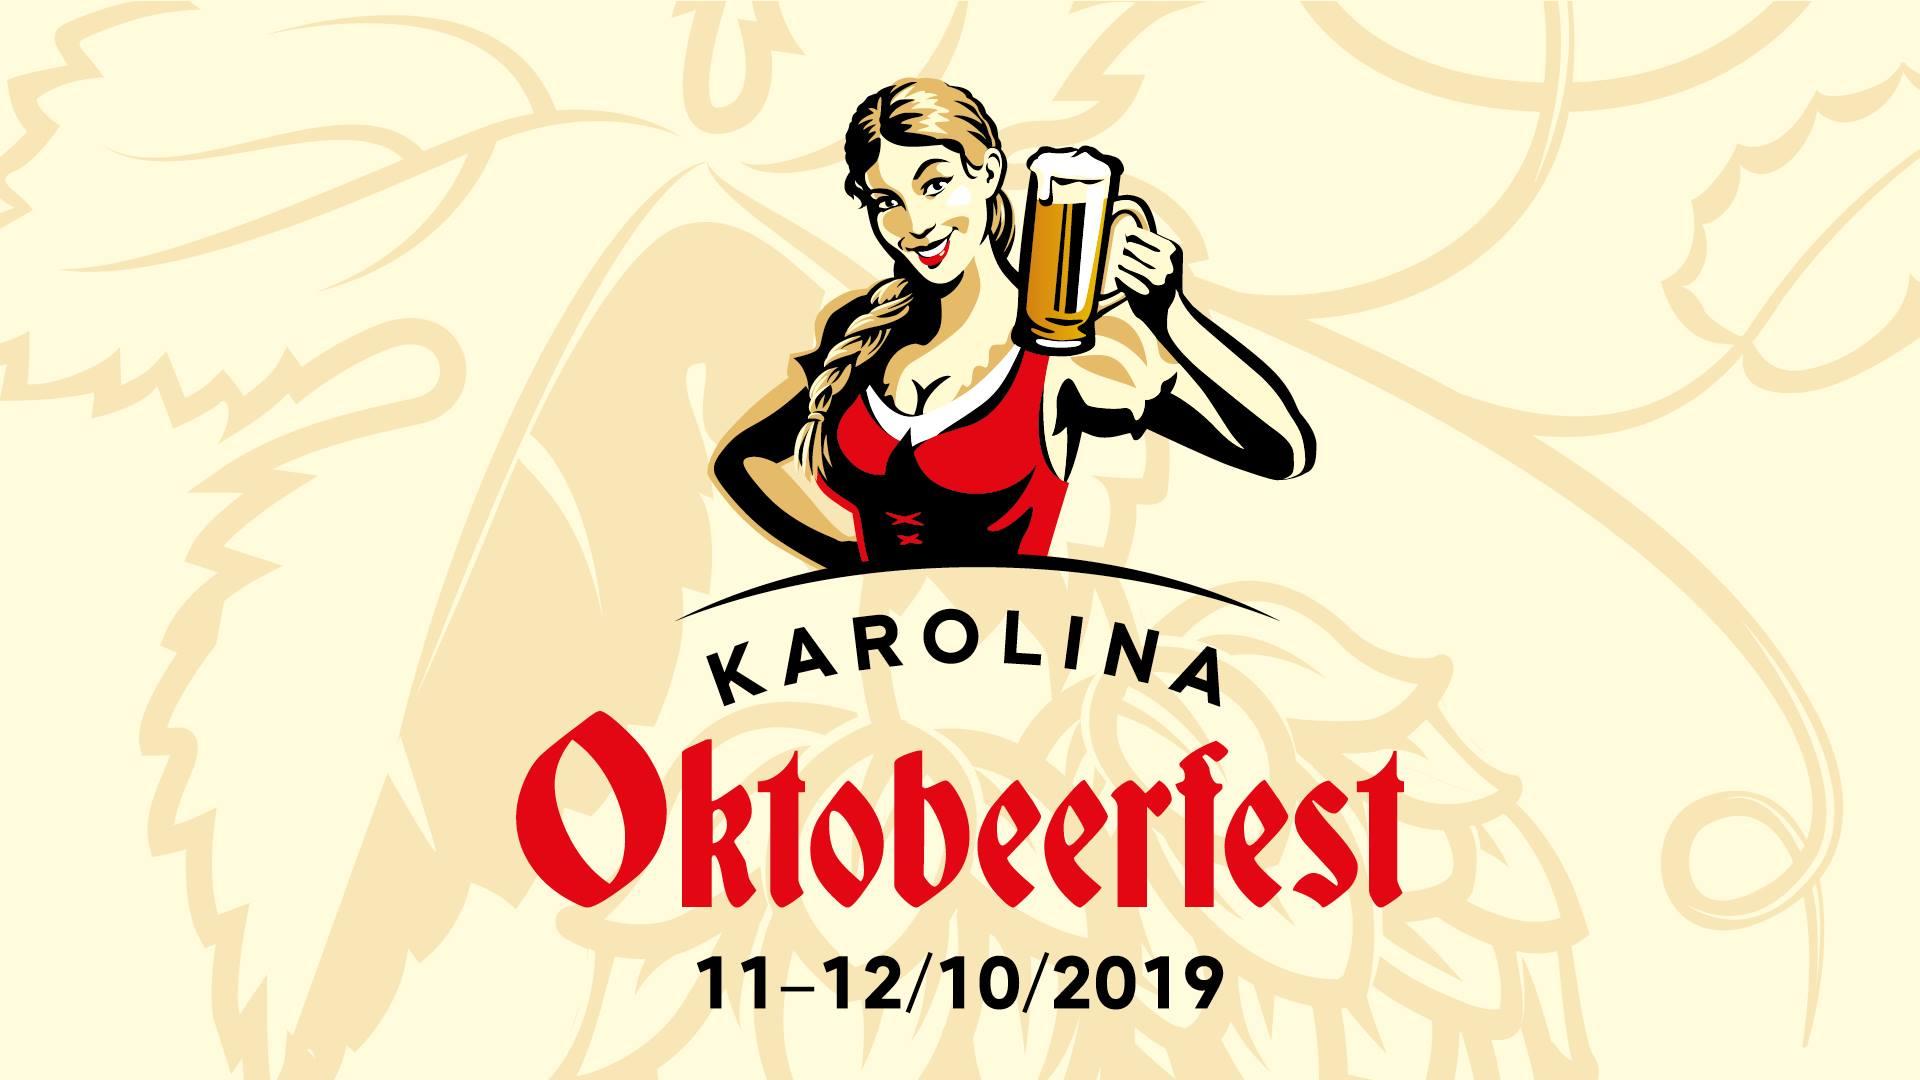 pivovari-pivovary-pivni-akce-karolina-oktobeerfest-2019